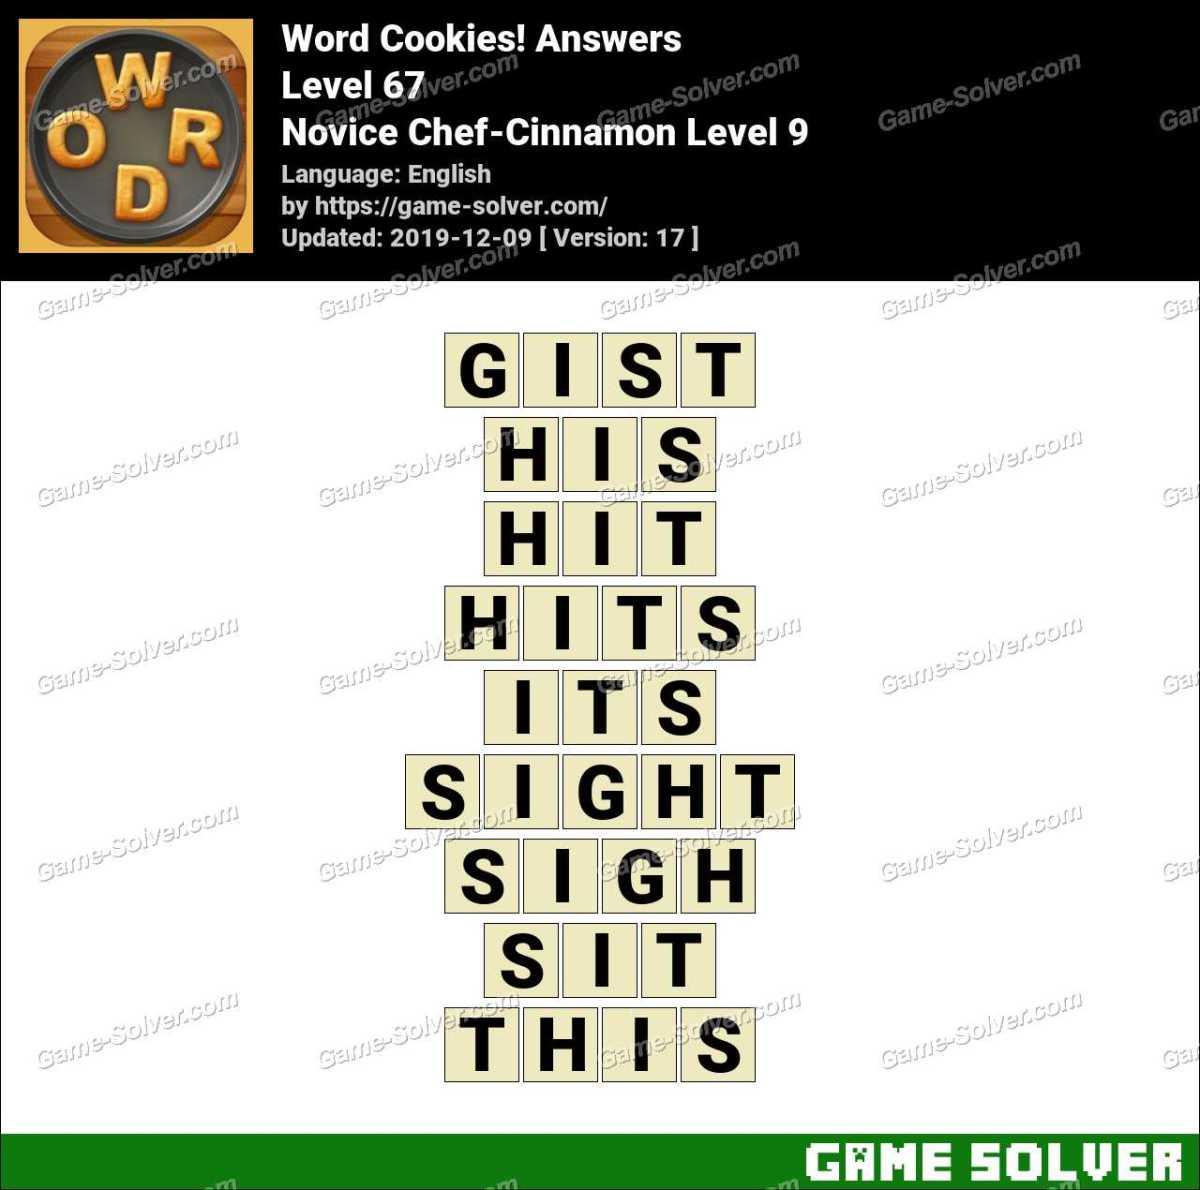 Word Cookies Novice Chef-Cinnamon Level 9 Answers